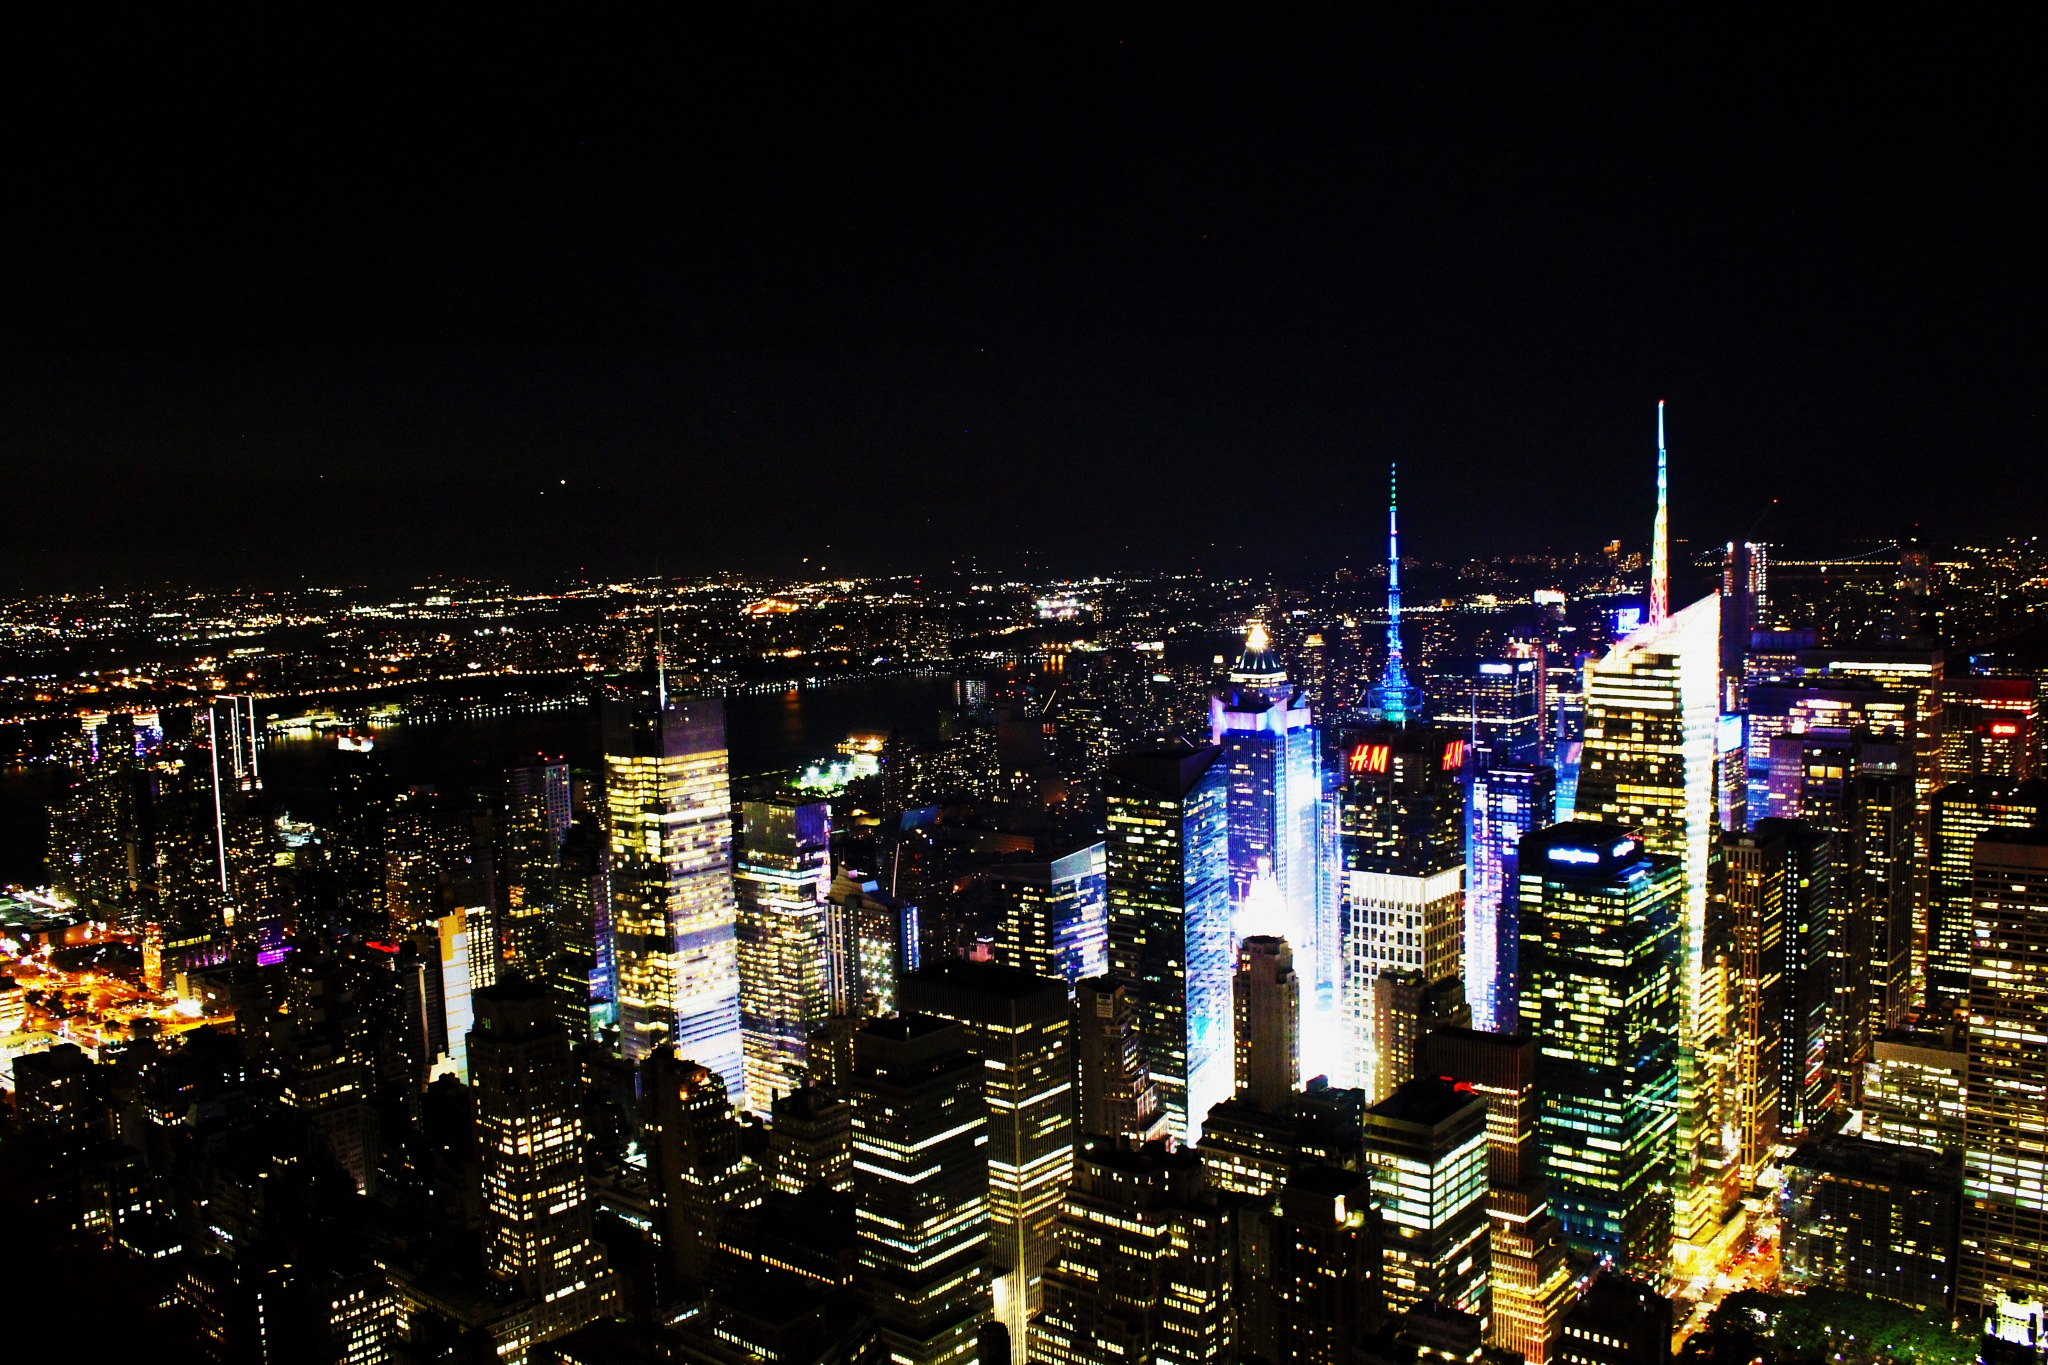 Manhattan newyork at night by Shanil Shah